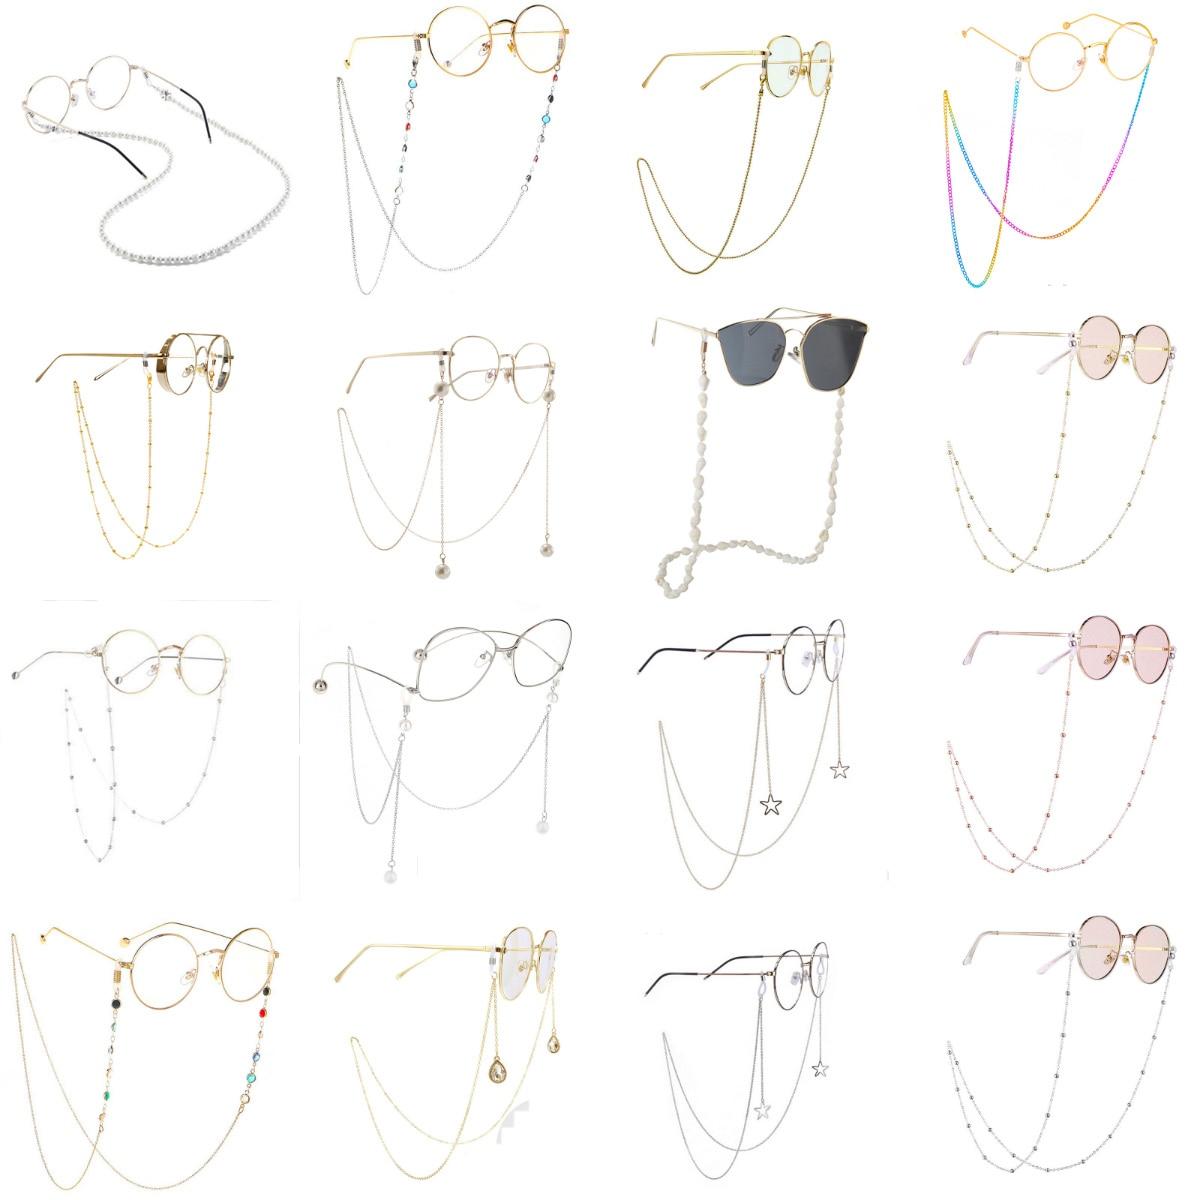 1pcs  Fashion Eyeglass Strap Reading Glasses Hanging Chain Sunglasses Spectacles Holder Neck Cord Glasses Slip Metal Chain